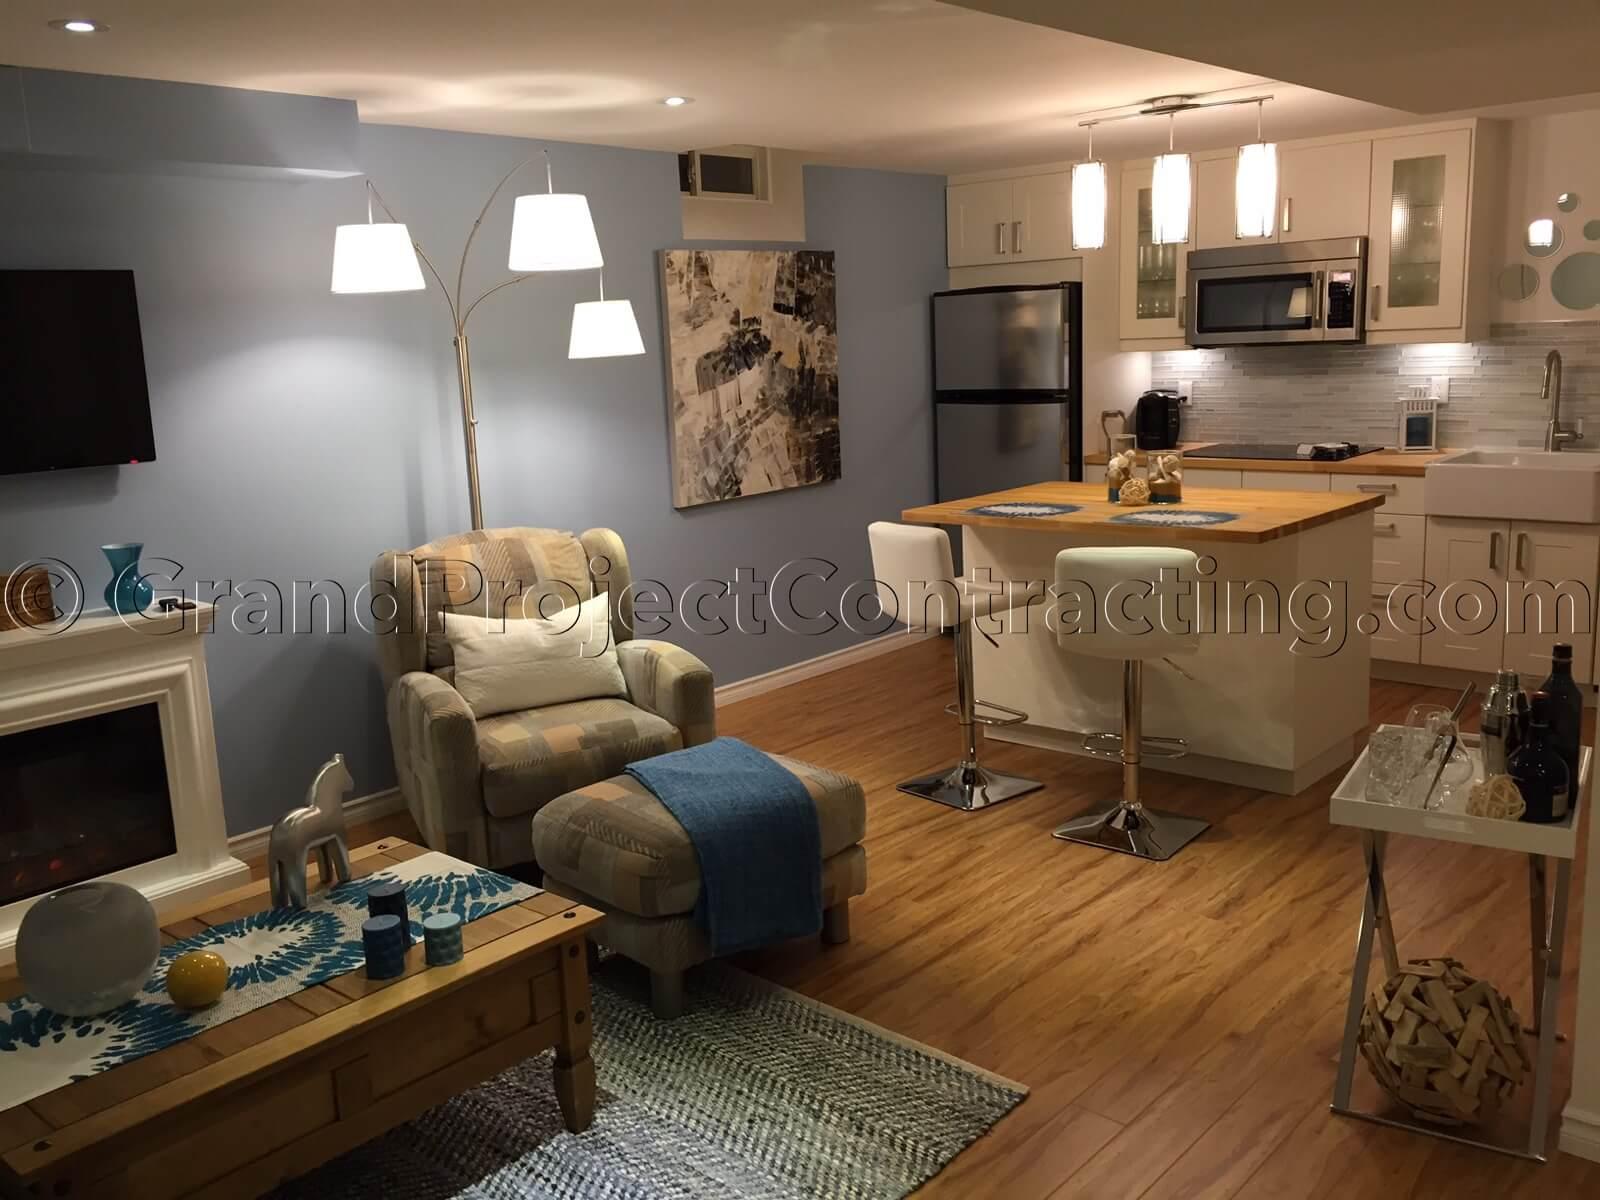 industrial kitchen backsplash island with granite top basement finishing in milton, renovation